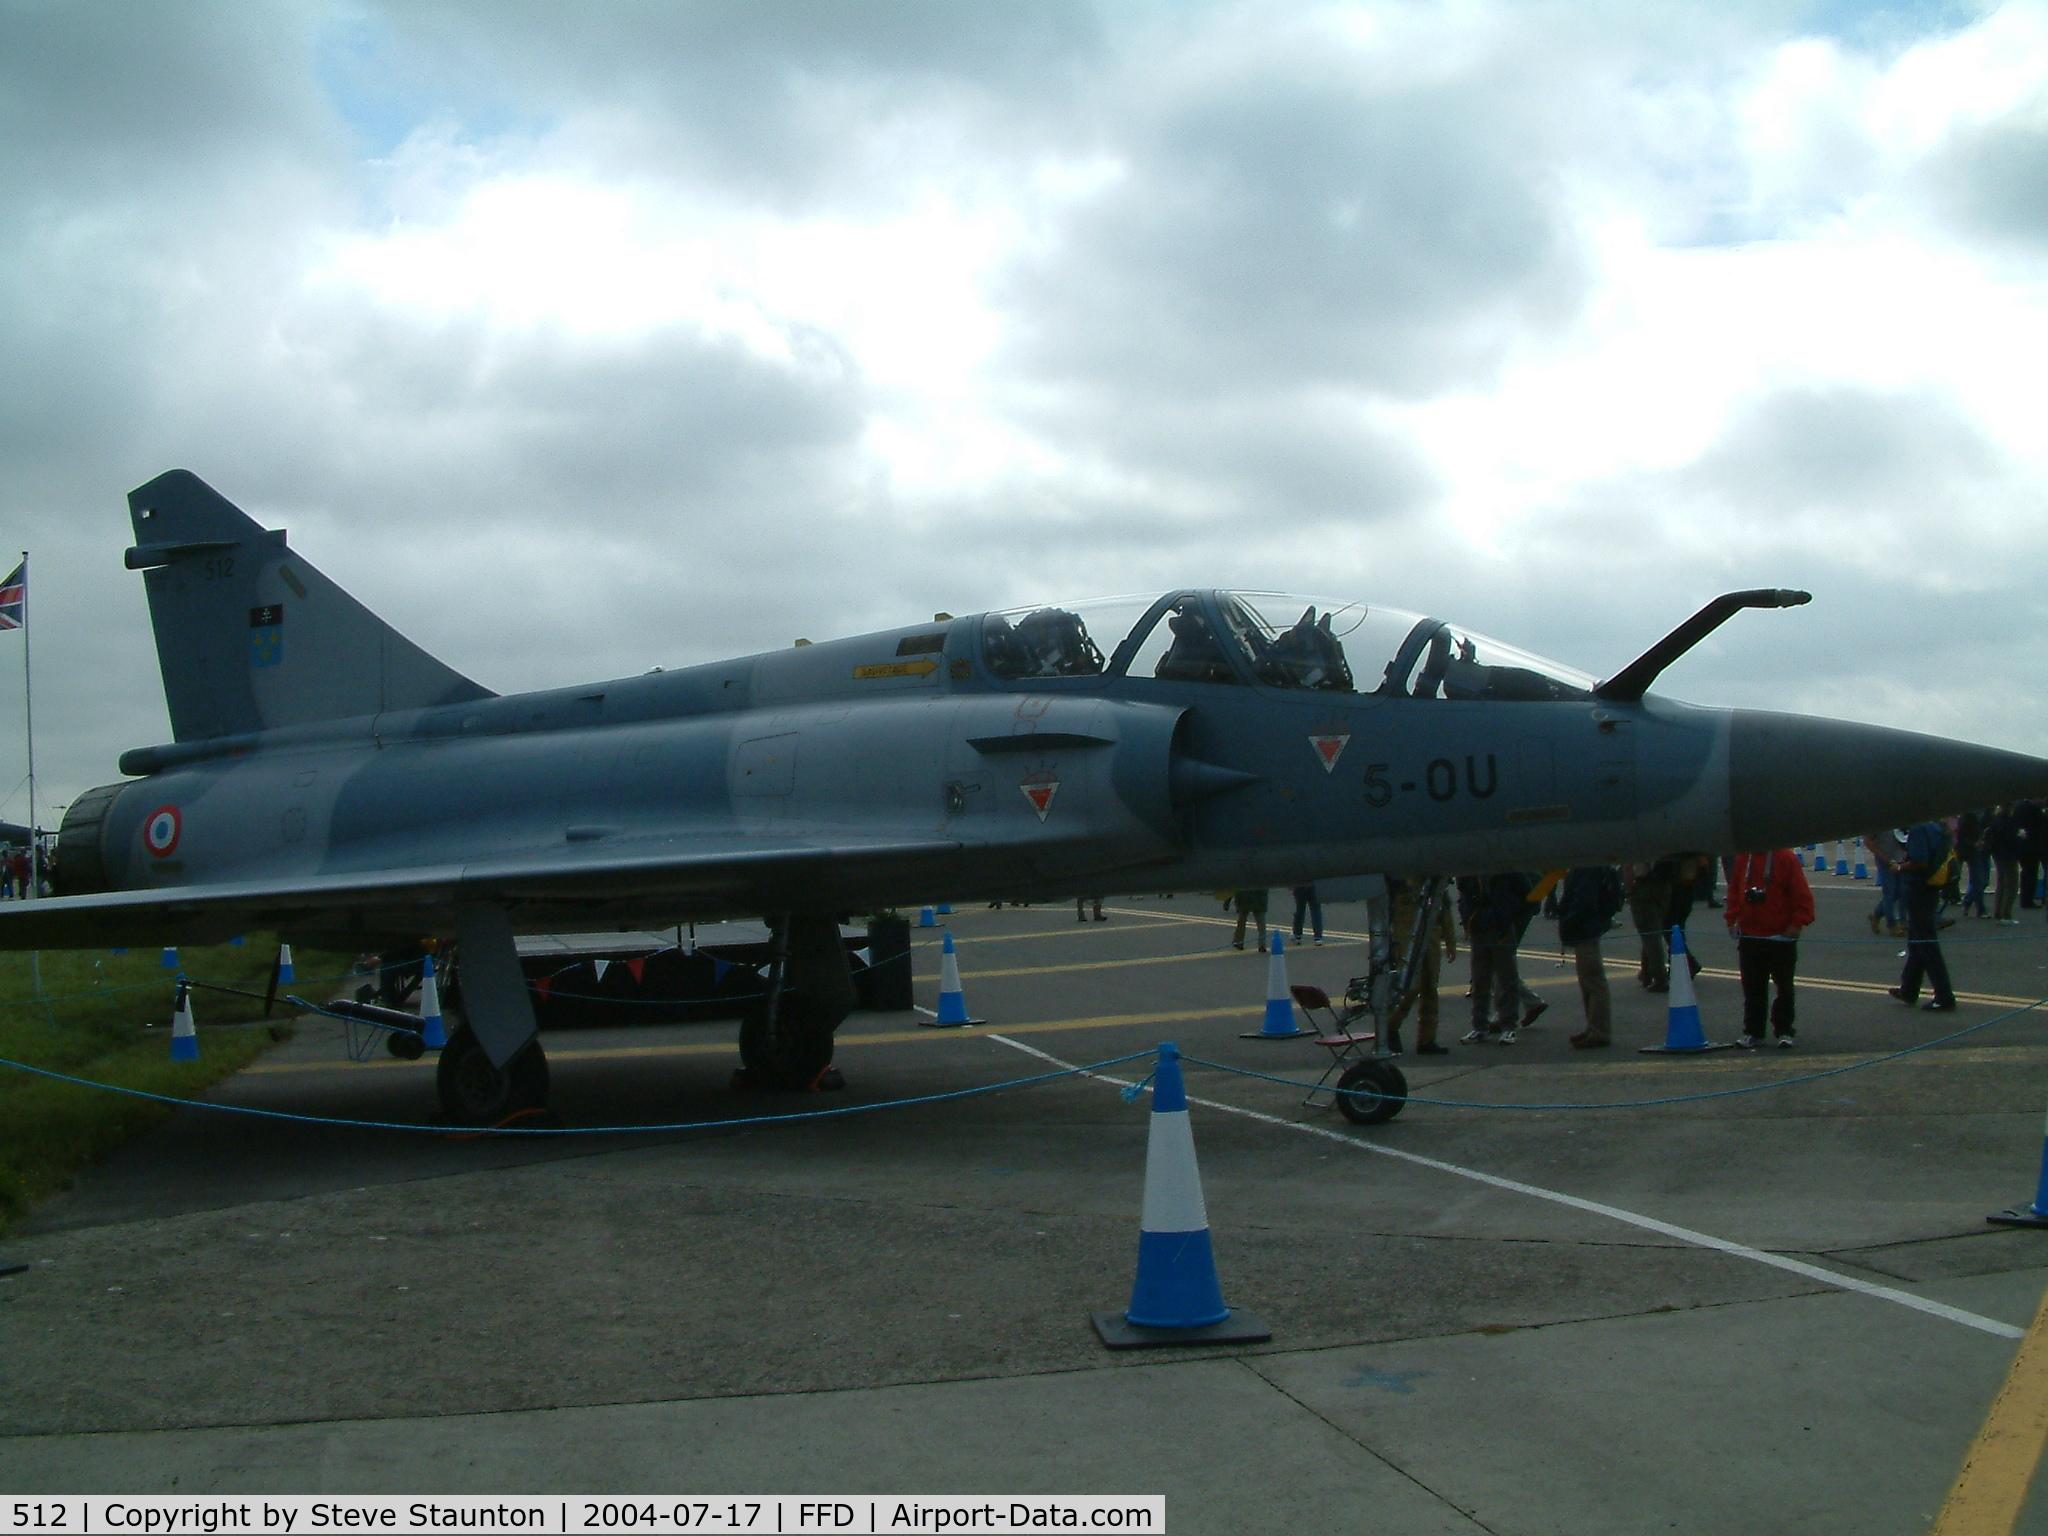 512, Dassault Mirage 2000B C/N 145, Royal International Air Tattoo 2004